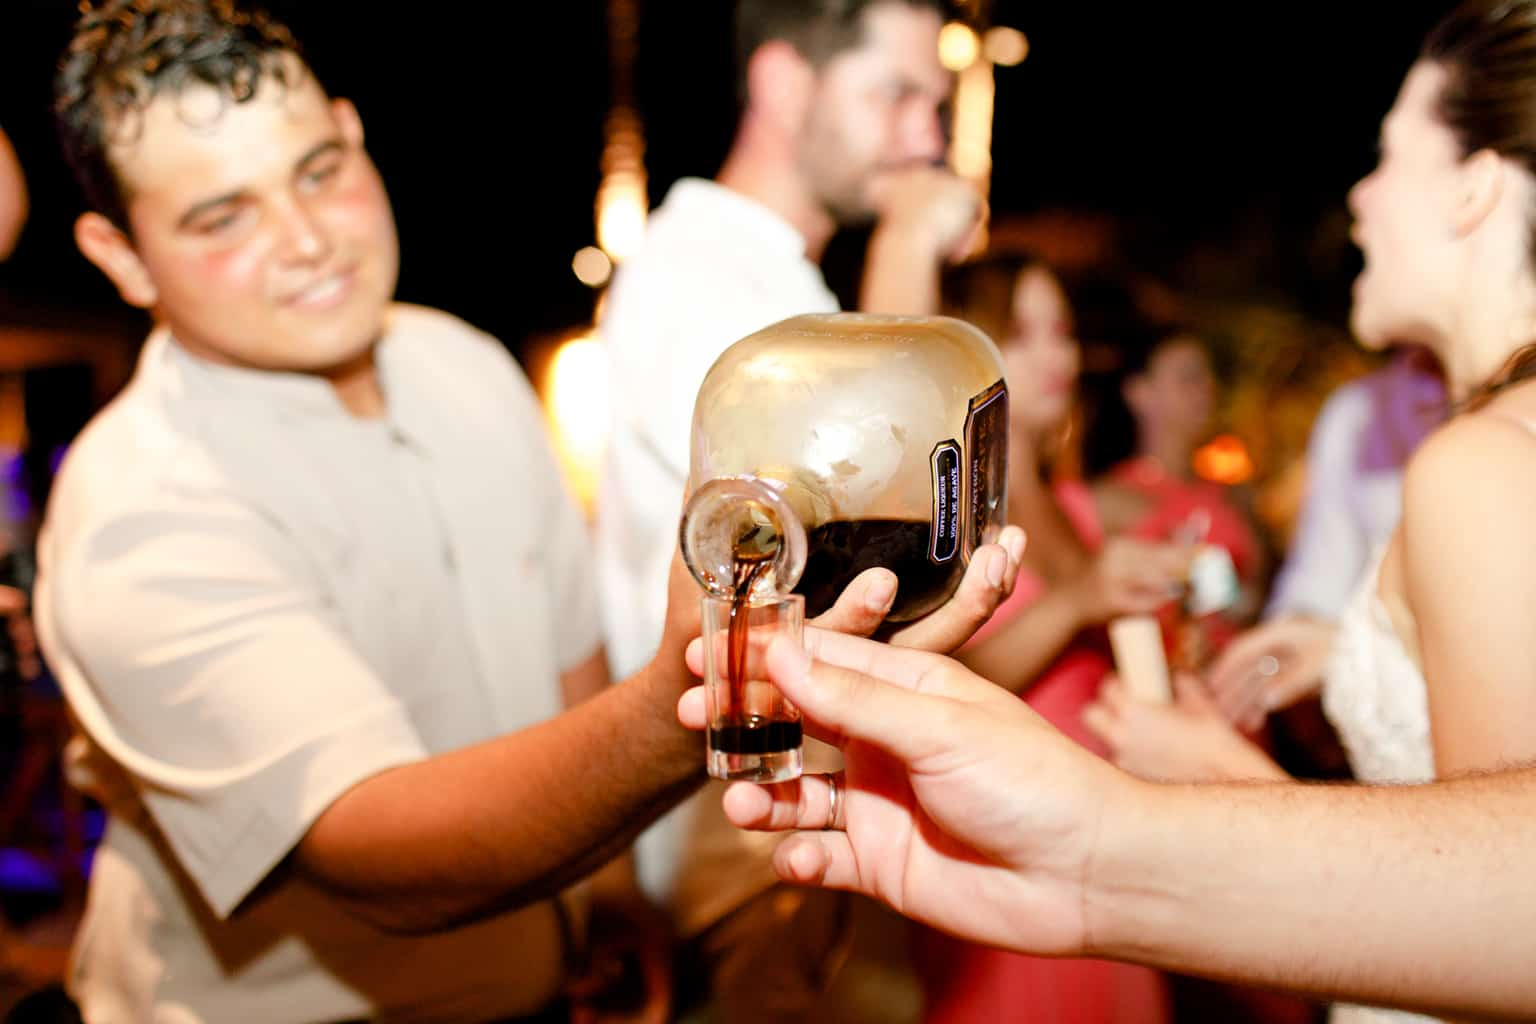 Casamento-Emanuelle-e-Alysson-Fotografia-Tadeu-Nanó-e-Luca-Antunes161